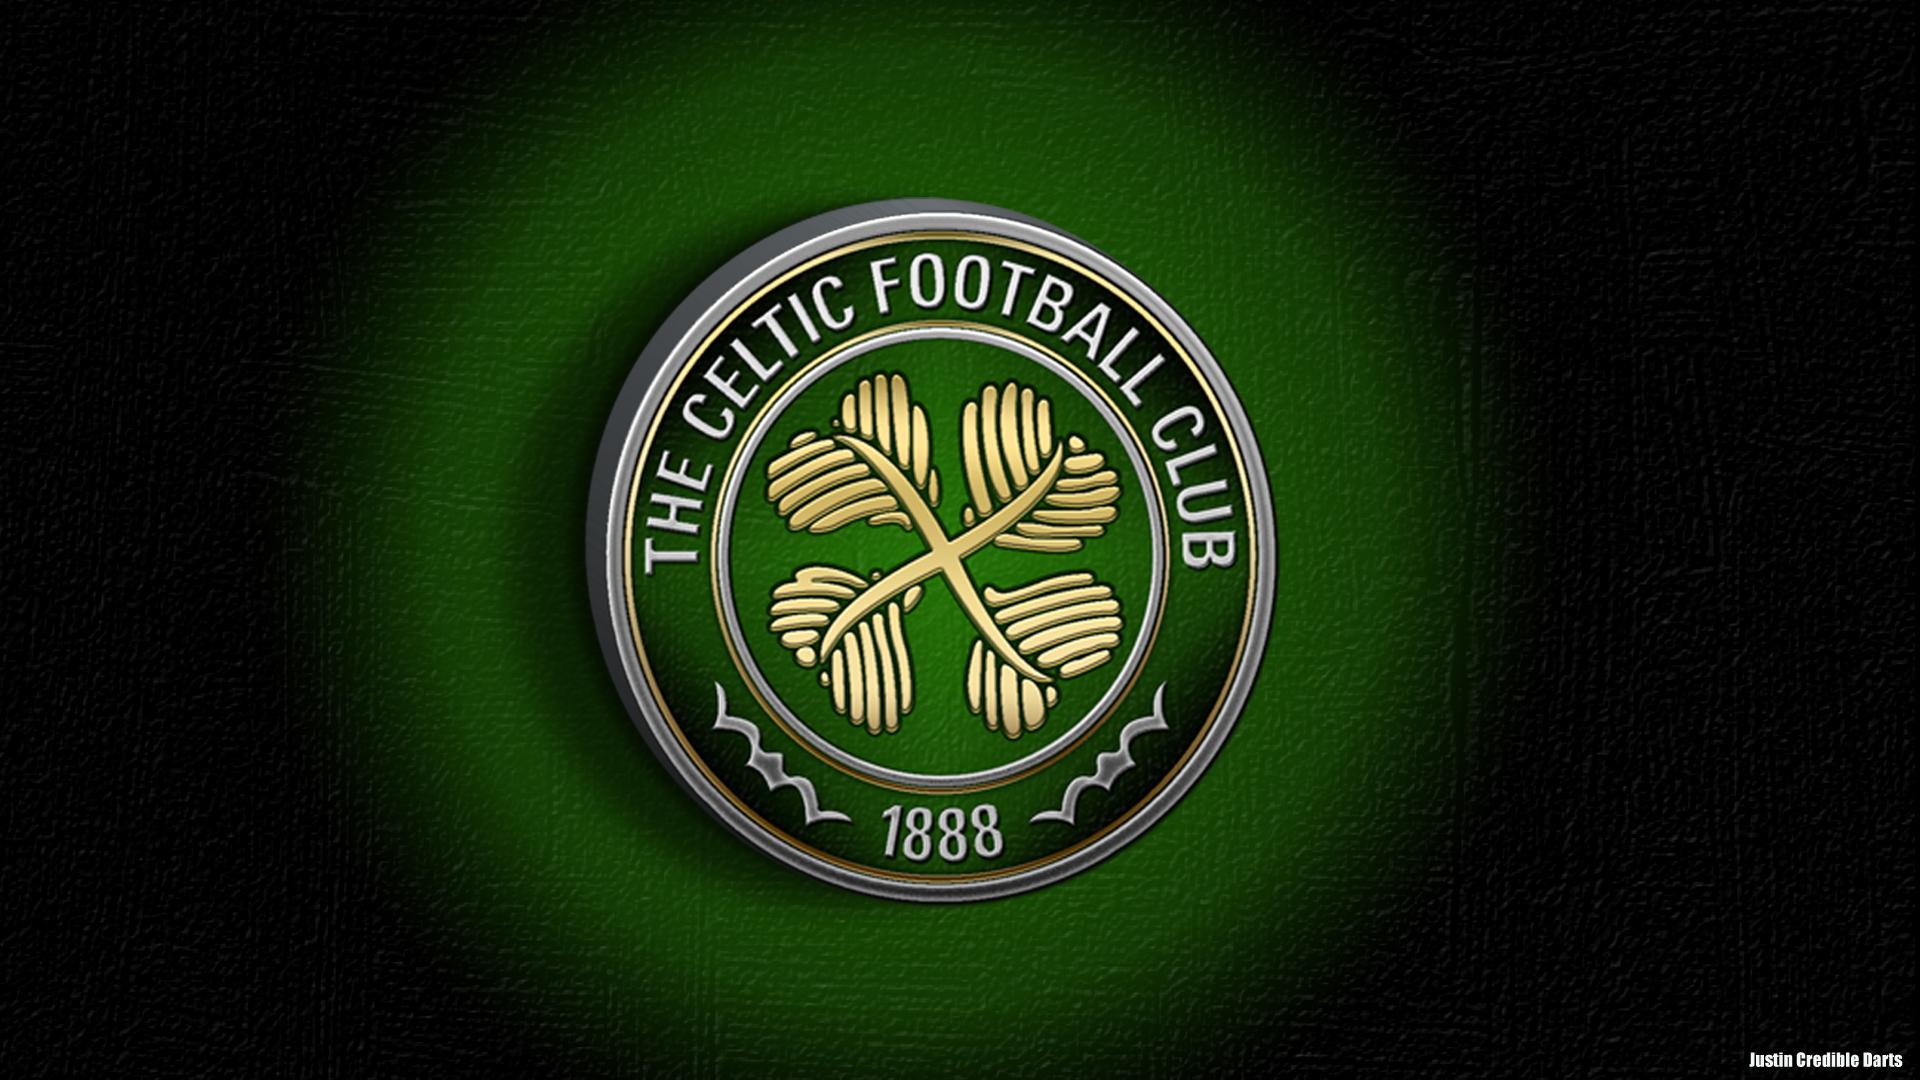 celtic fc - photo #13